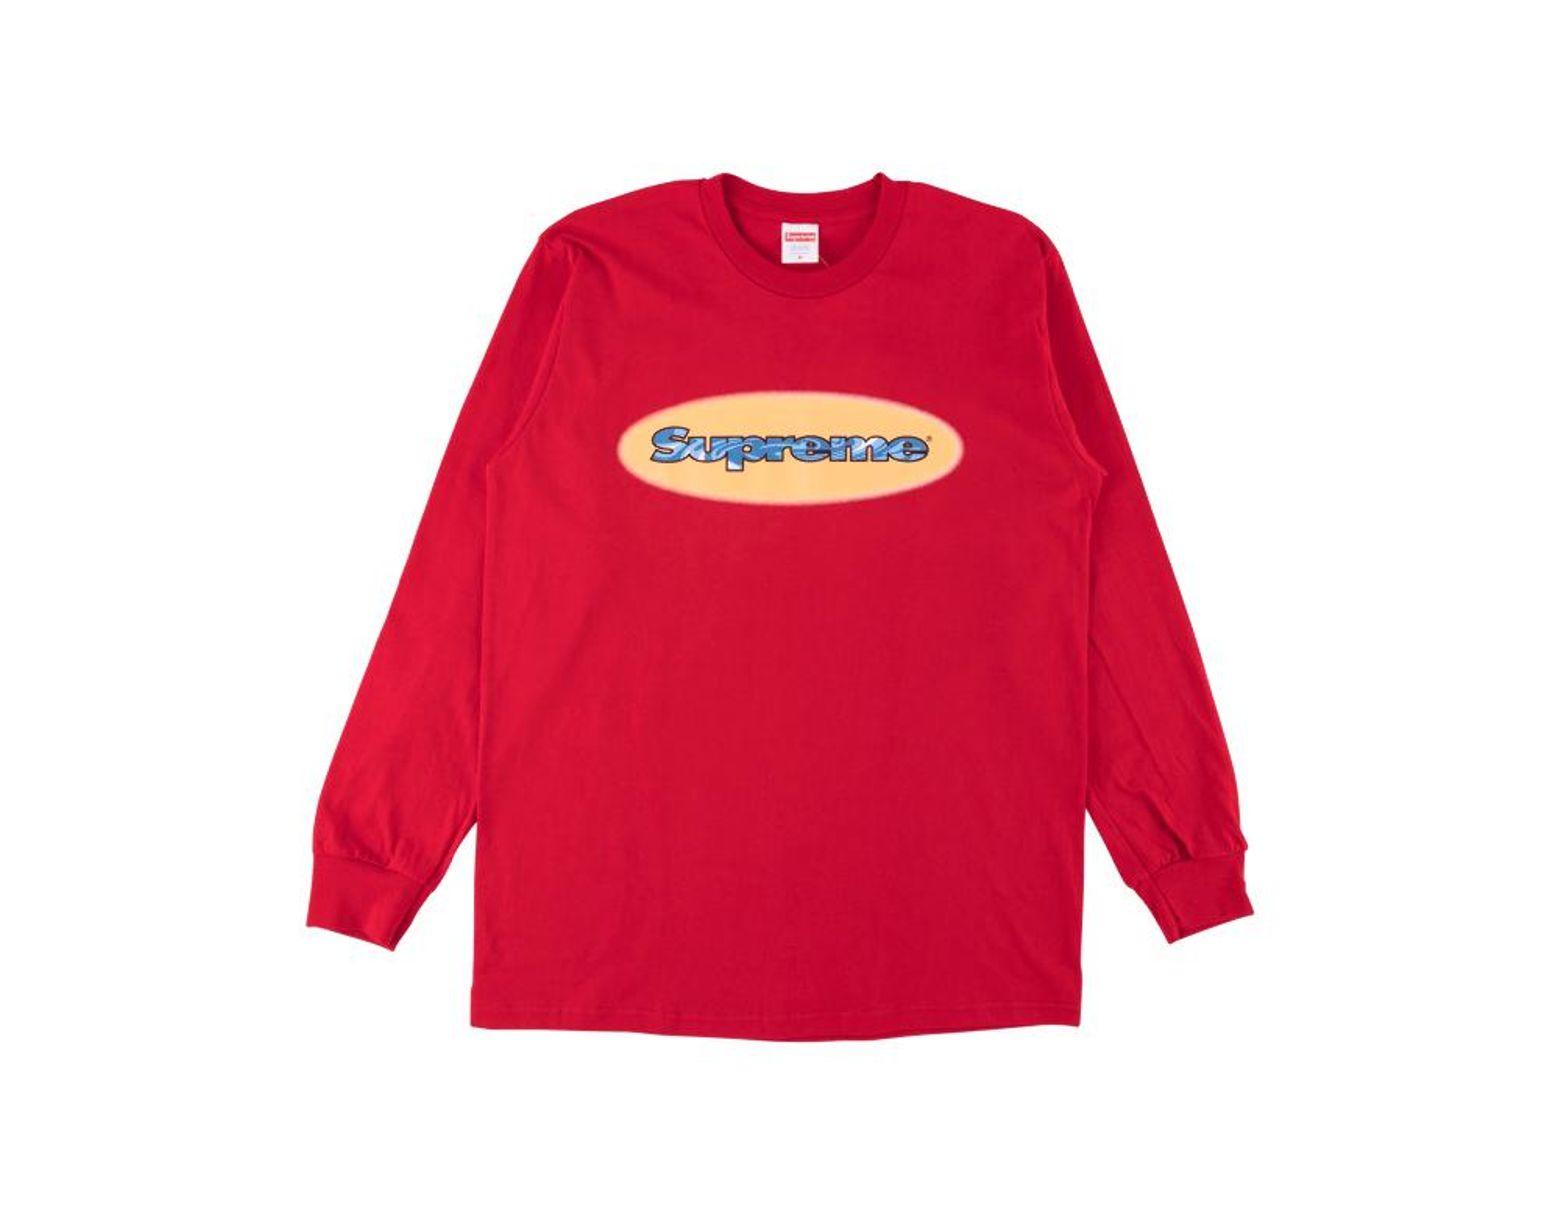 b9d3e7e32a Supreme Ripple Longsleeve T-shirt 'ss 18' in Red for Men - Lyst